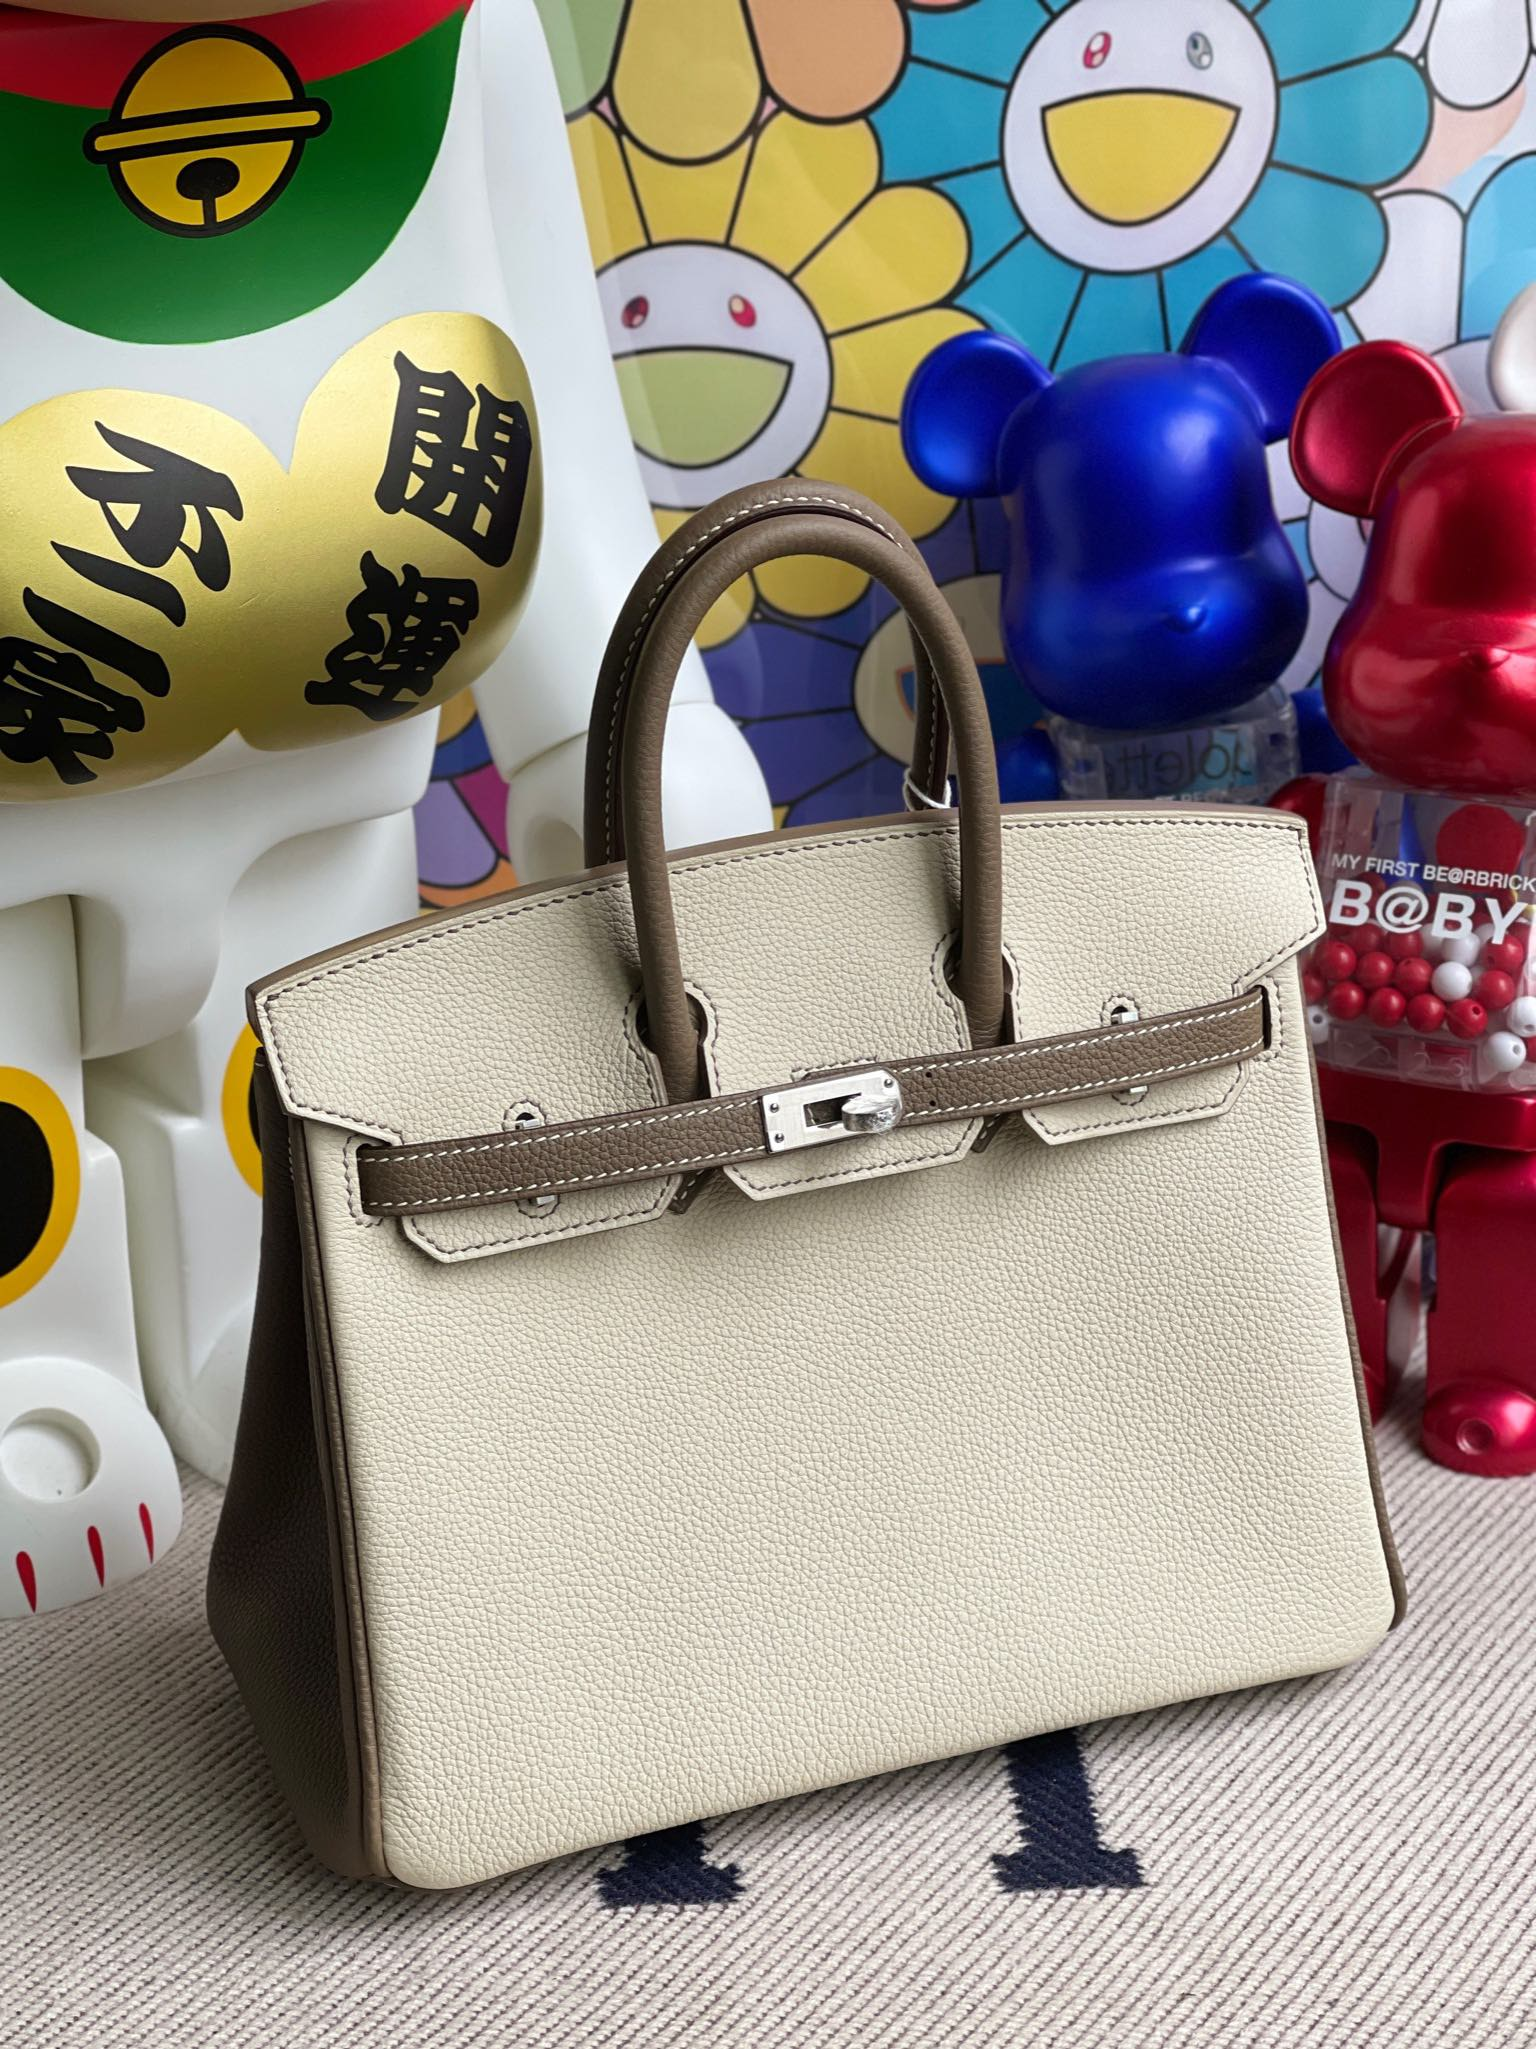 Hermès(爱马仕)Birkin 铂金包 原厂小牛皮 togo 奶昔白 拼 大象灰 银扣 马蹄印 25cm 顶级手缝